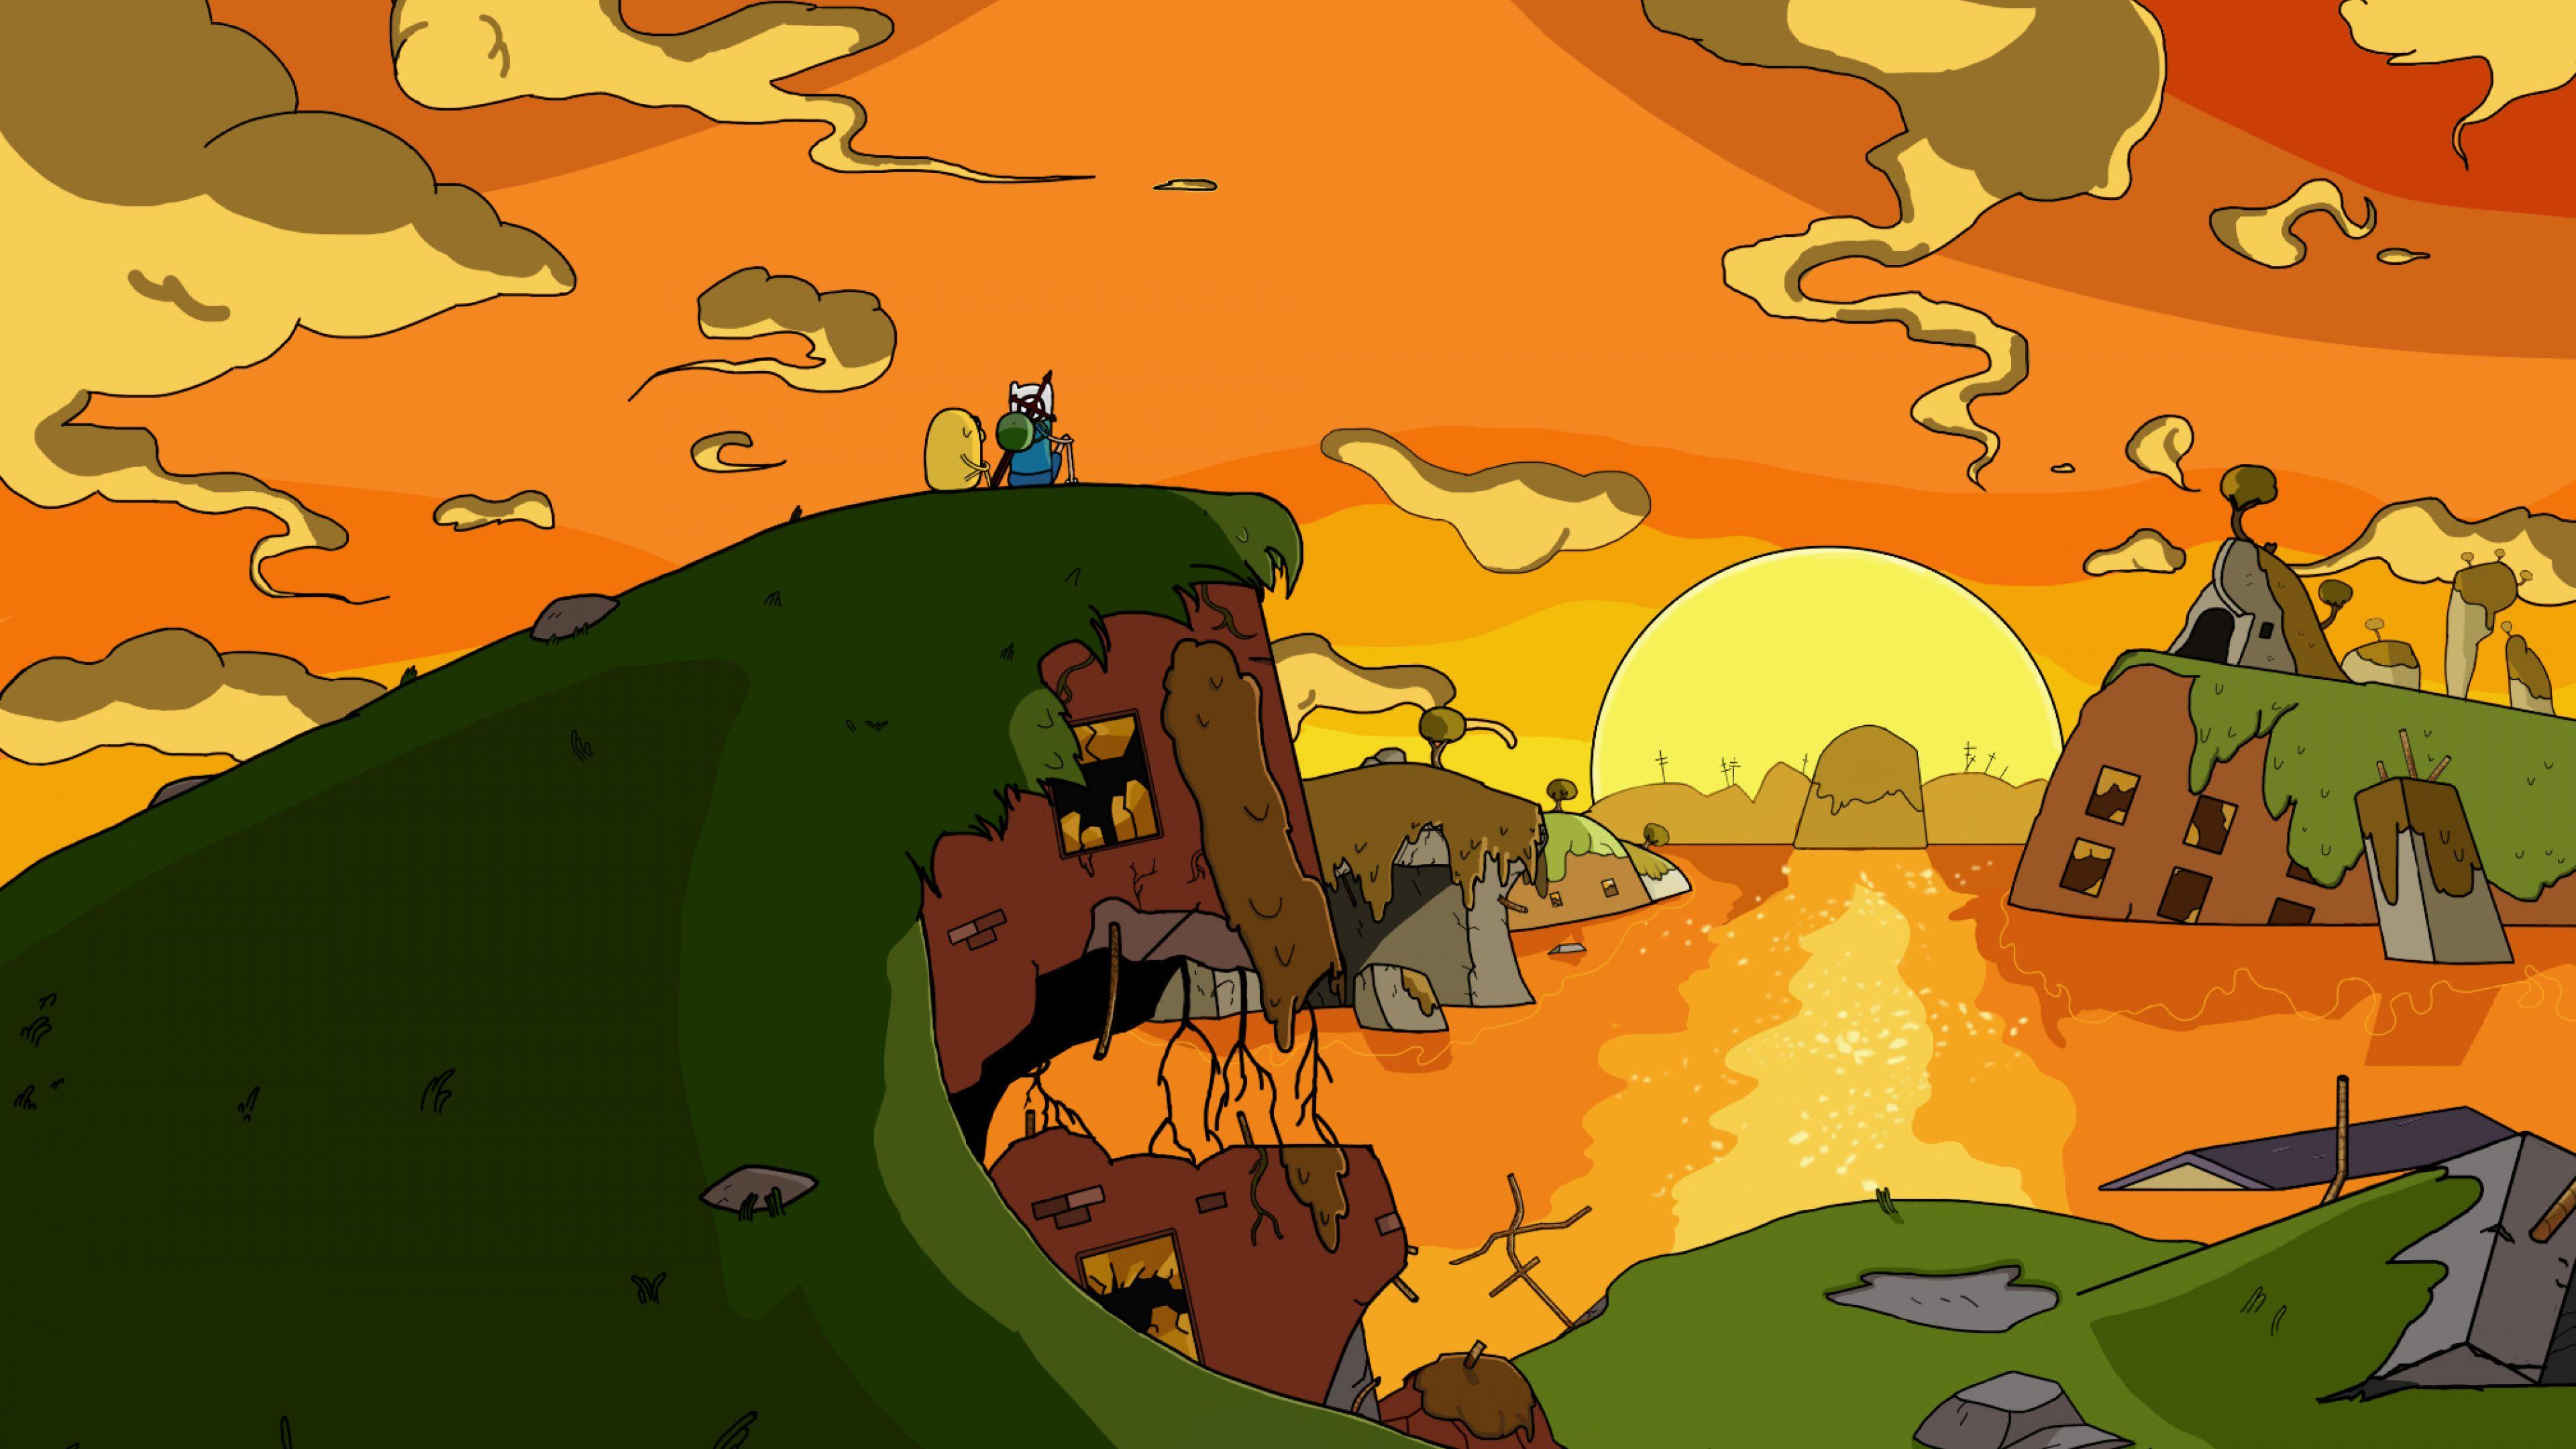 3840x2160 Adventure Time Wallpaper Vi750 Vizidbooth Wallpaper Blog Adventure Time Wallpaper Adventure Time Background Adventure Time Marceline